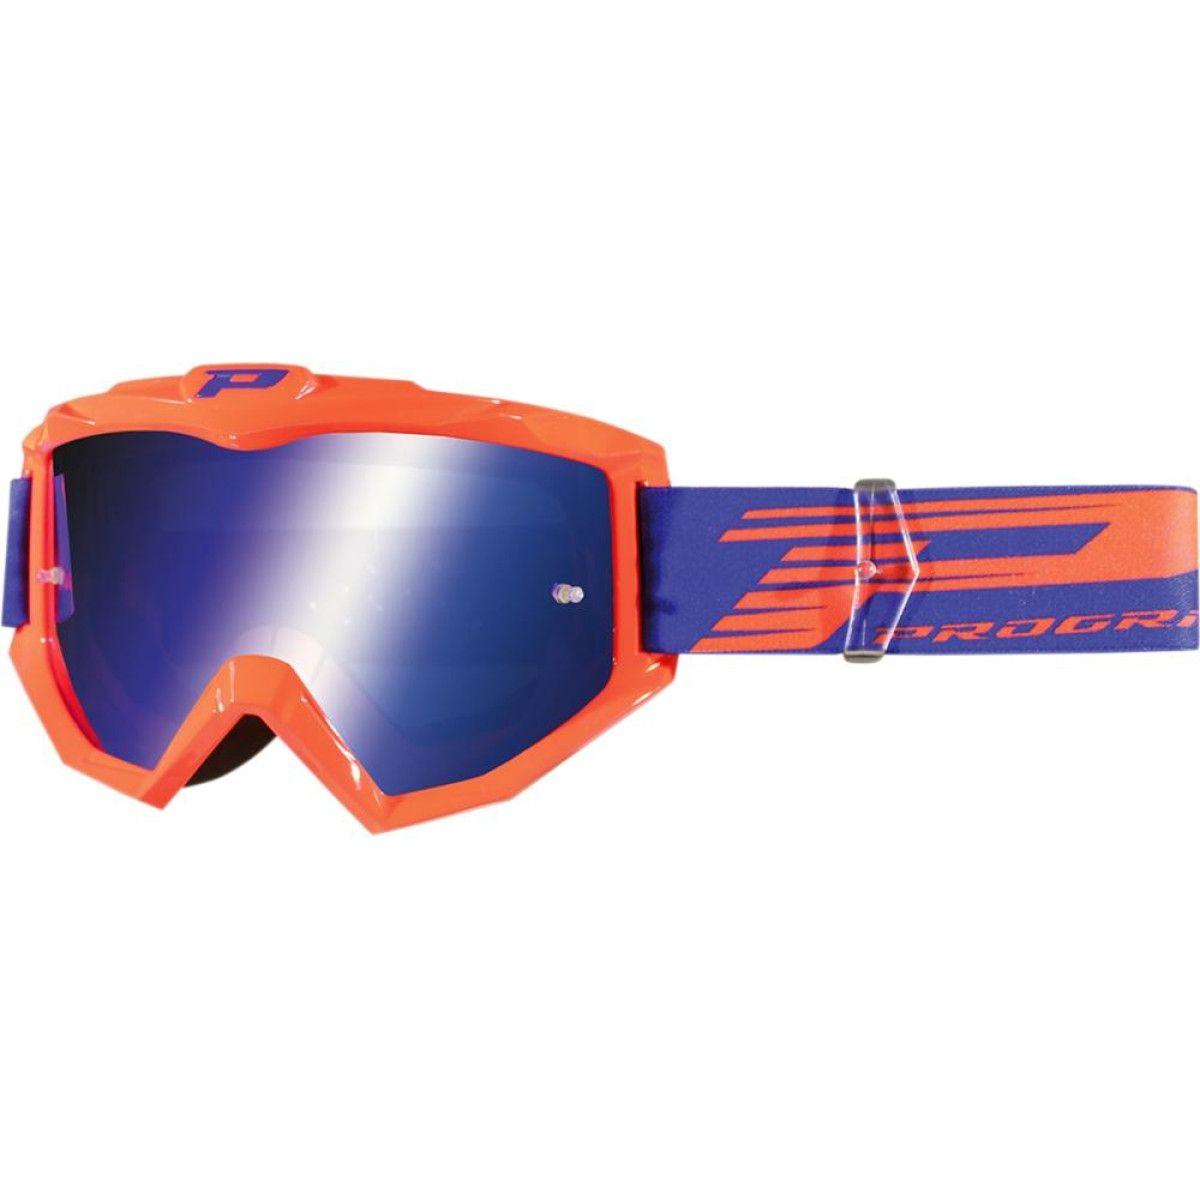 Progrip Crossbril 3201 FL Fluo Orange